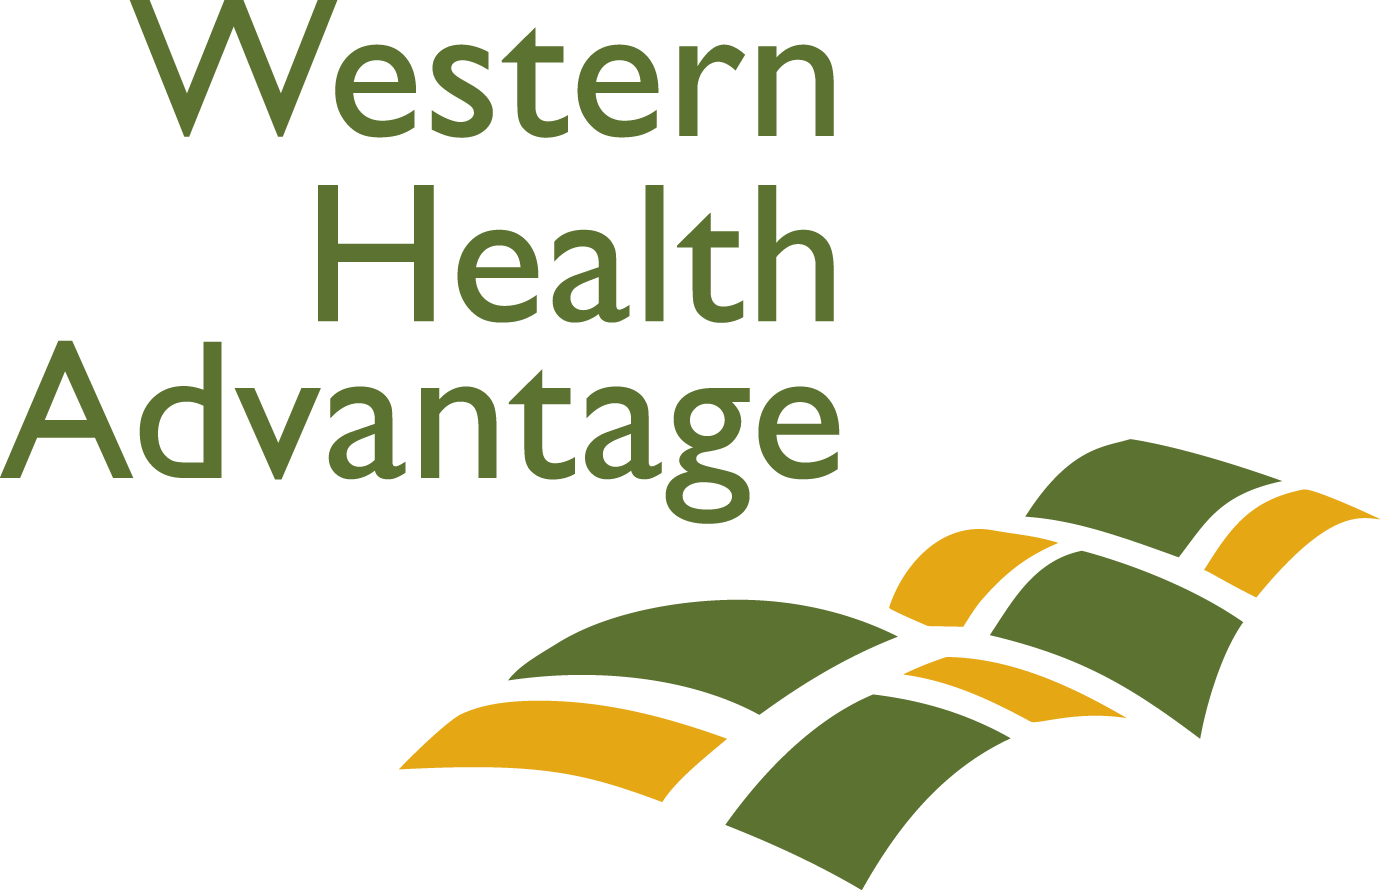 Copy of Western Health Advantage